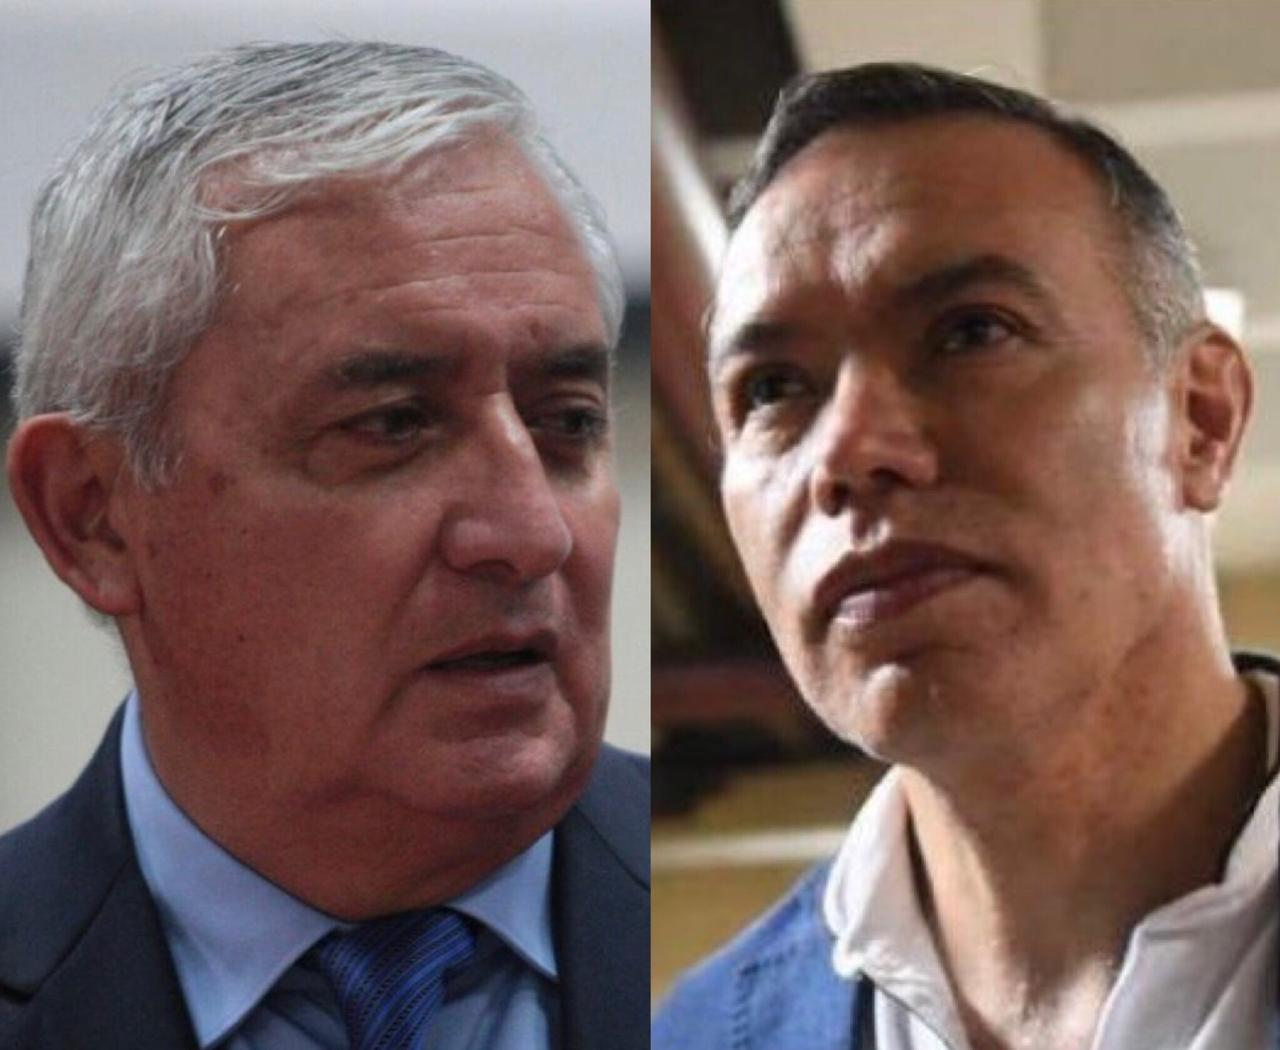 Citan a Otto Pérez y Juan de Dios Rodríguez